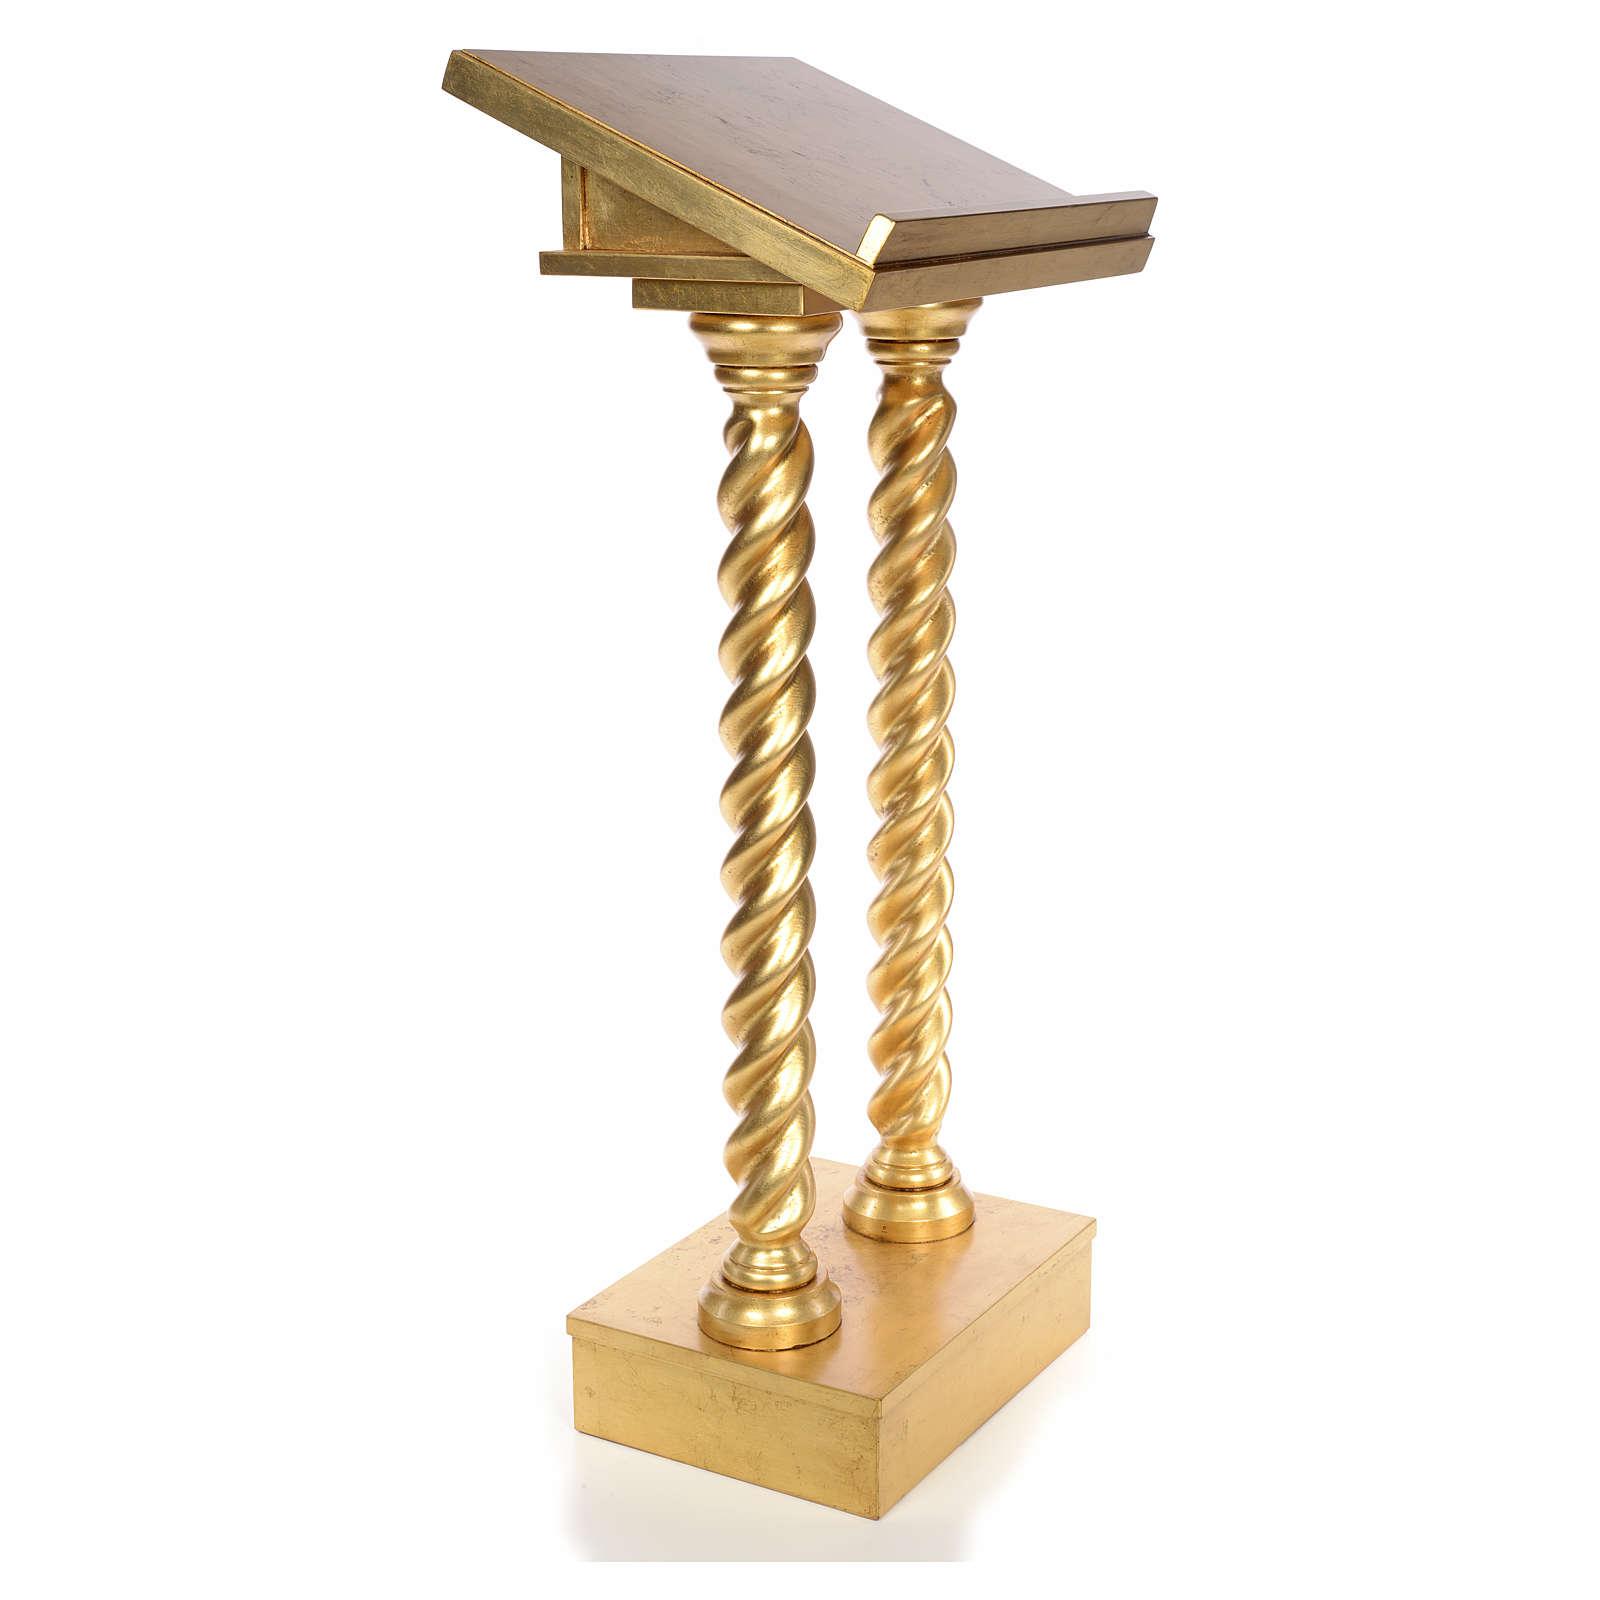 Atril en haya dos columnas salomónicas hoja oro 4